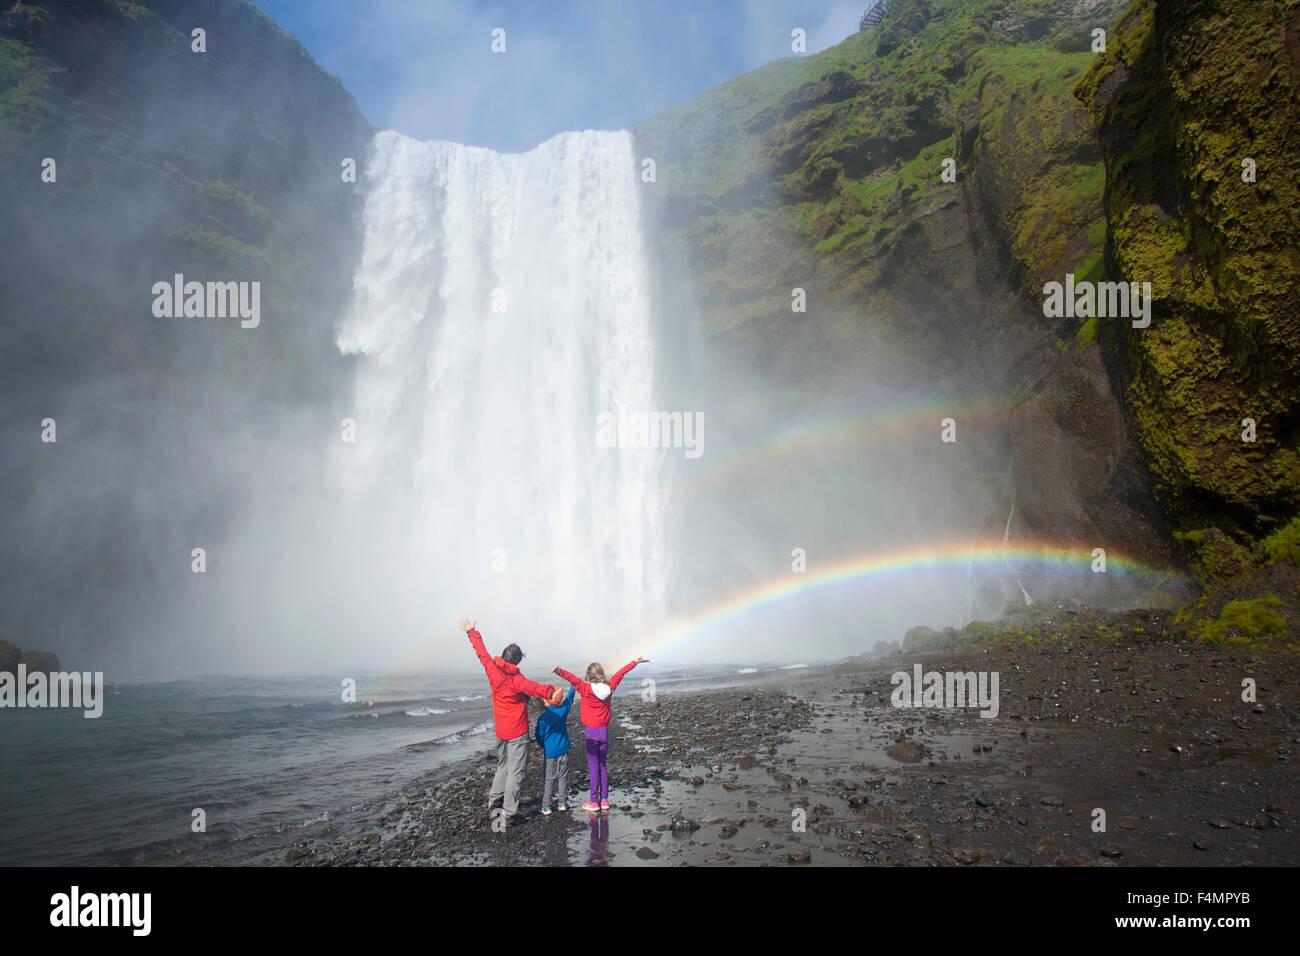 Family in the rainbow beneath 60m-high Skogafoss waterfall, Skogar, Sudhurland, Iceland. - Stock Image